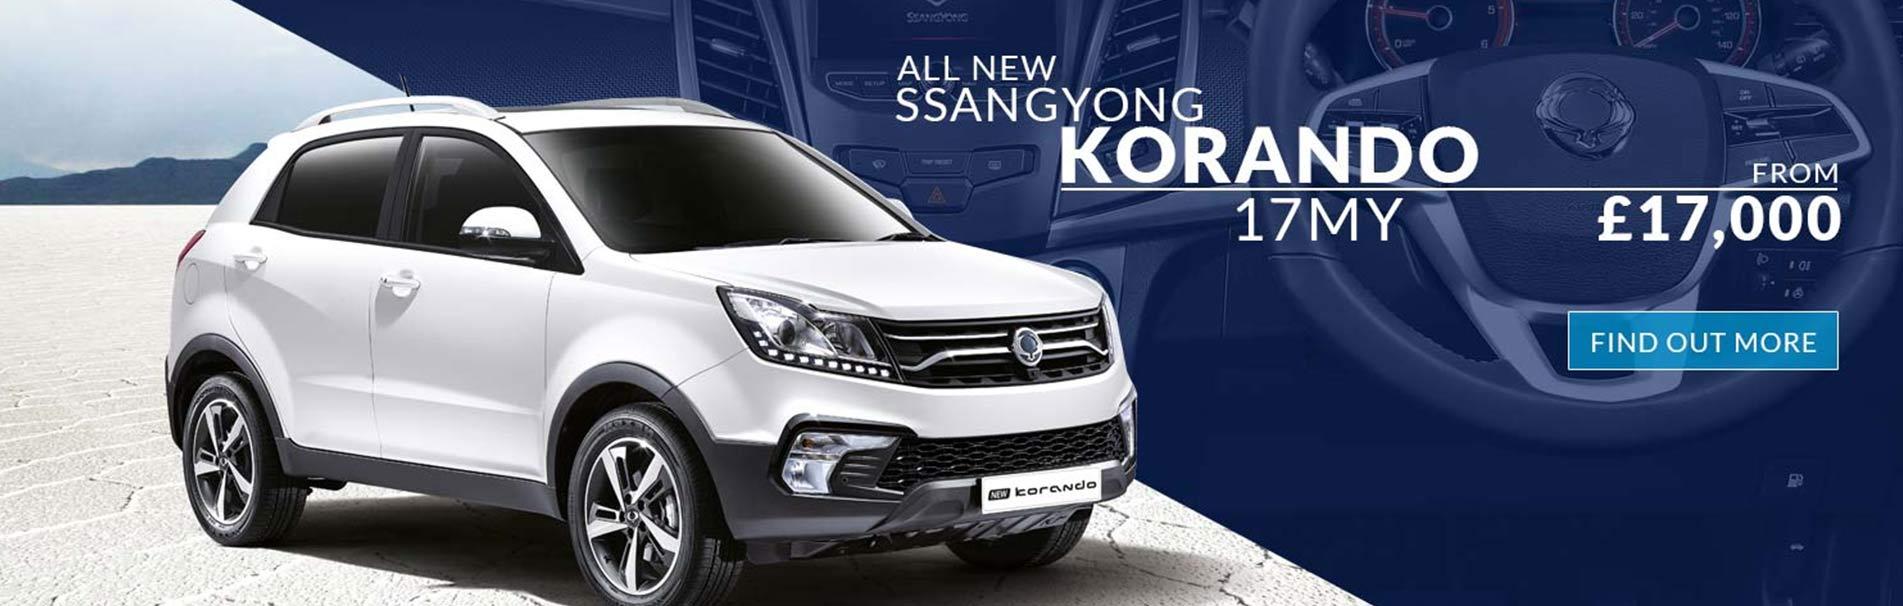 all-new-ssangyong-korando-my17